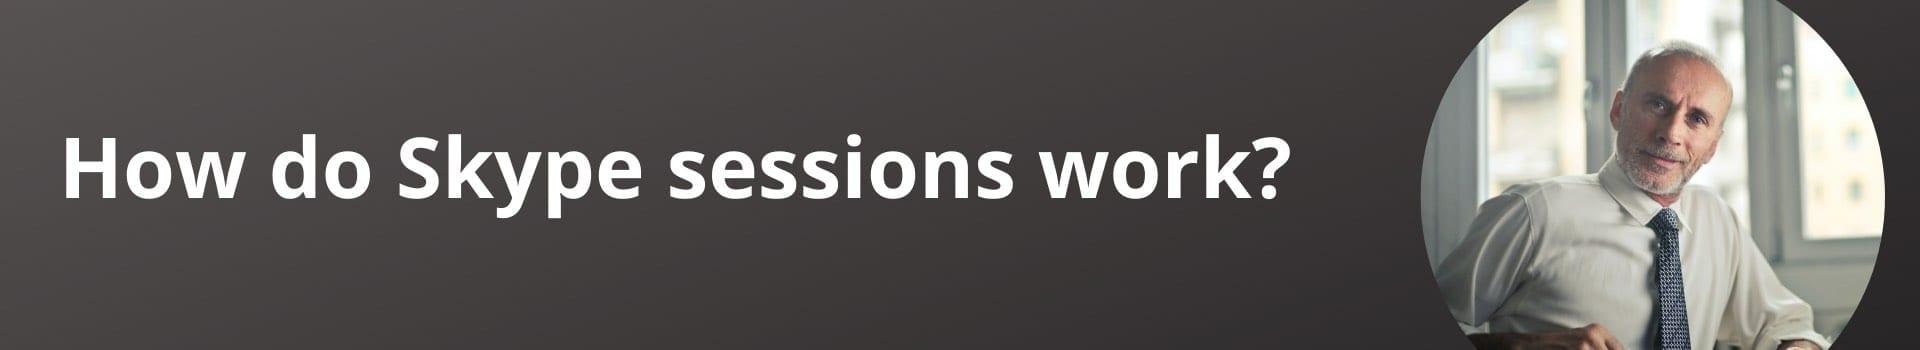 How do Skype sessions work?